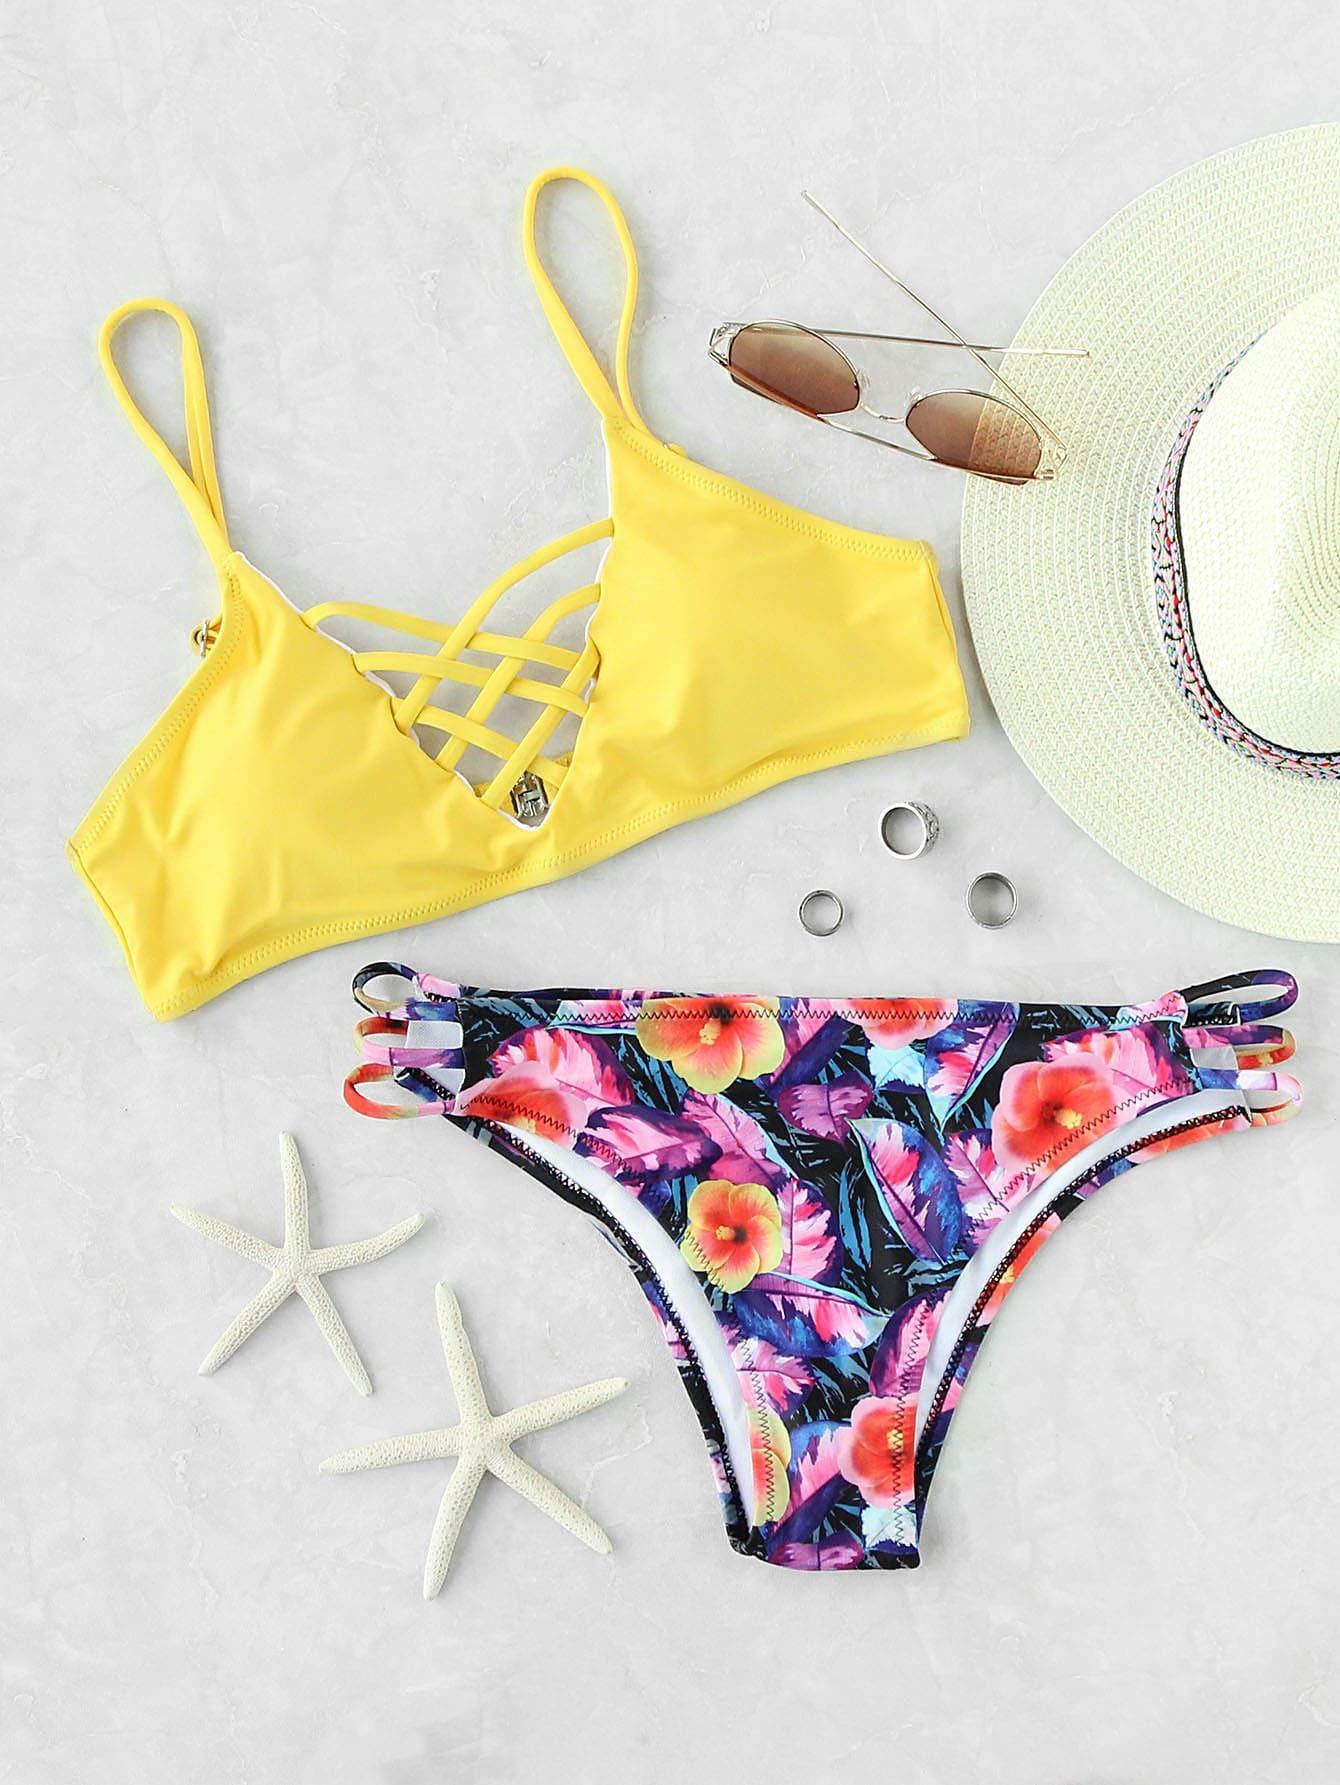 abacdb533e4 Yellow Floral Print Criss Cross Mix & Match Bikini Set EmmaCloth ...